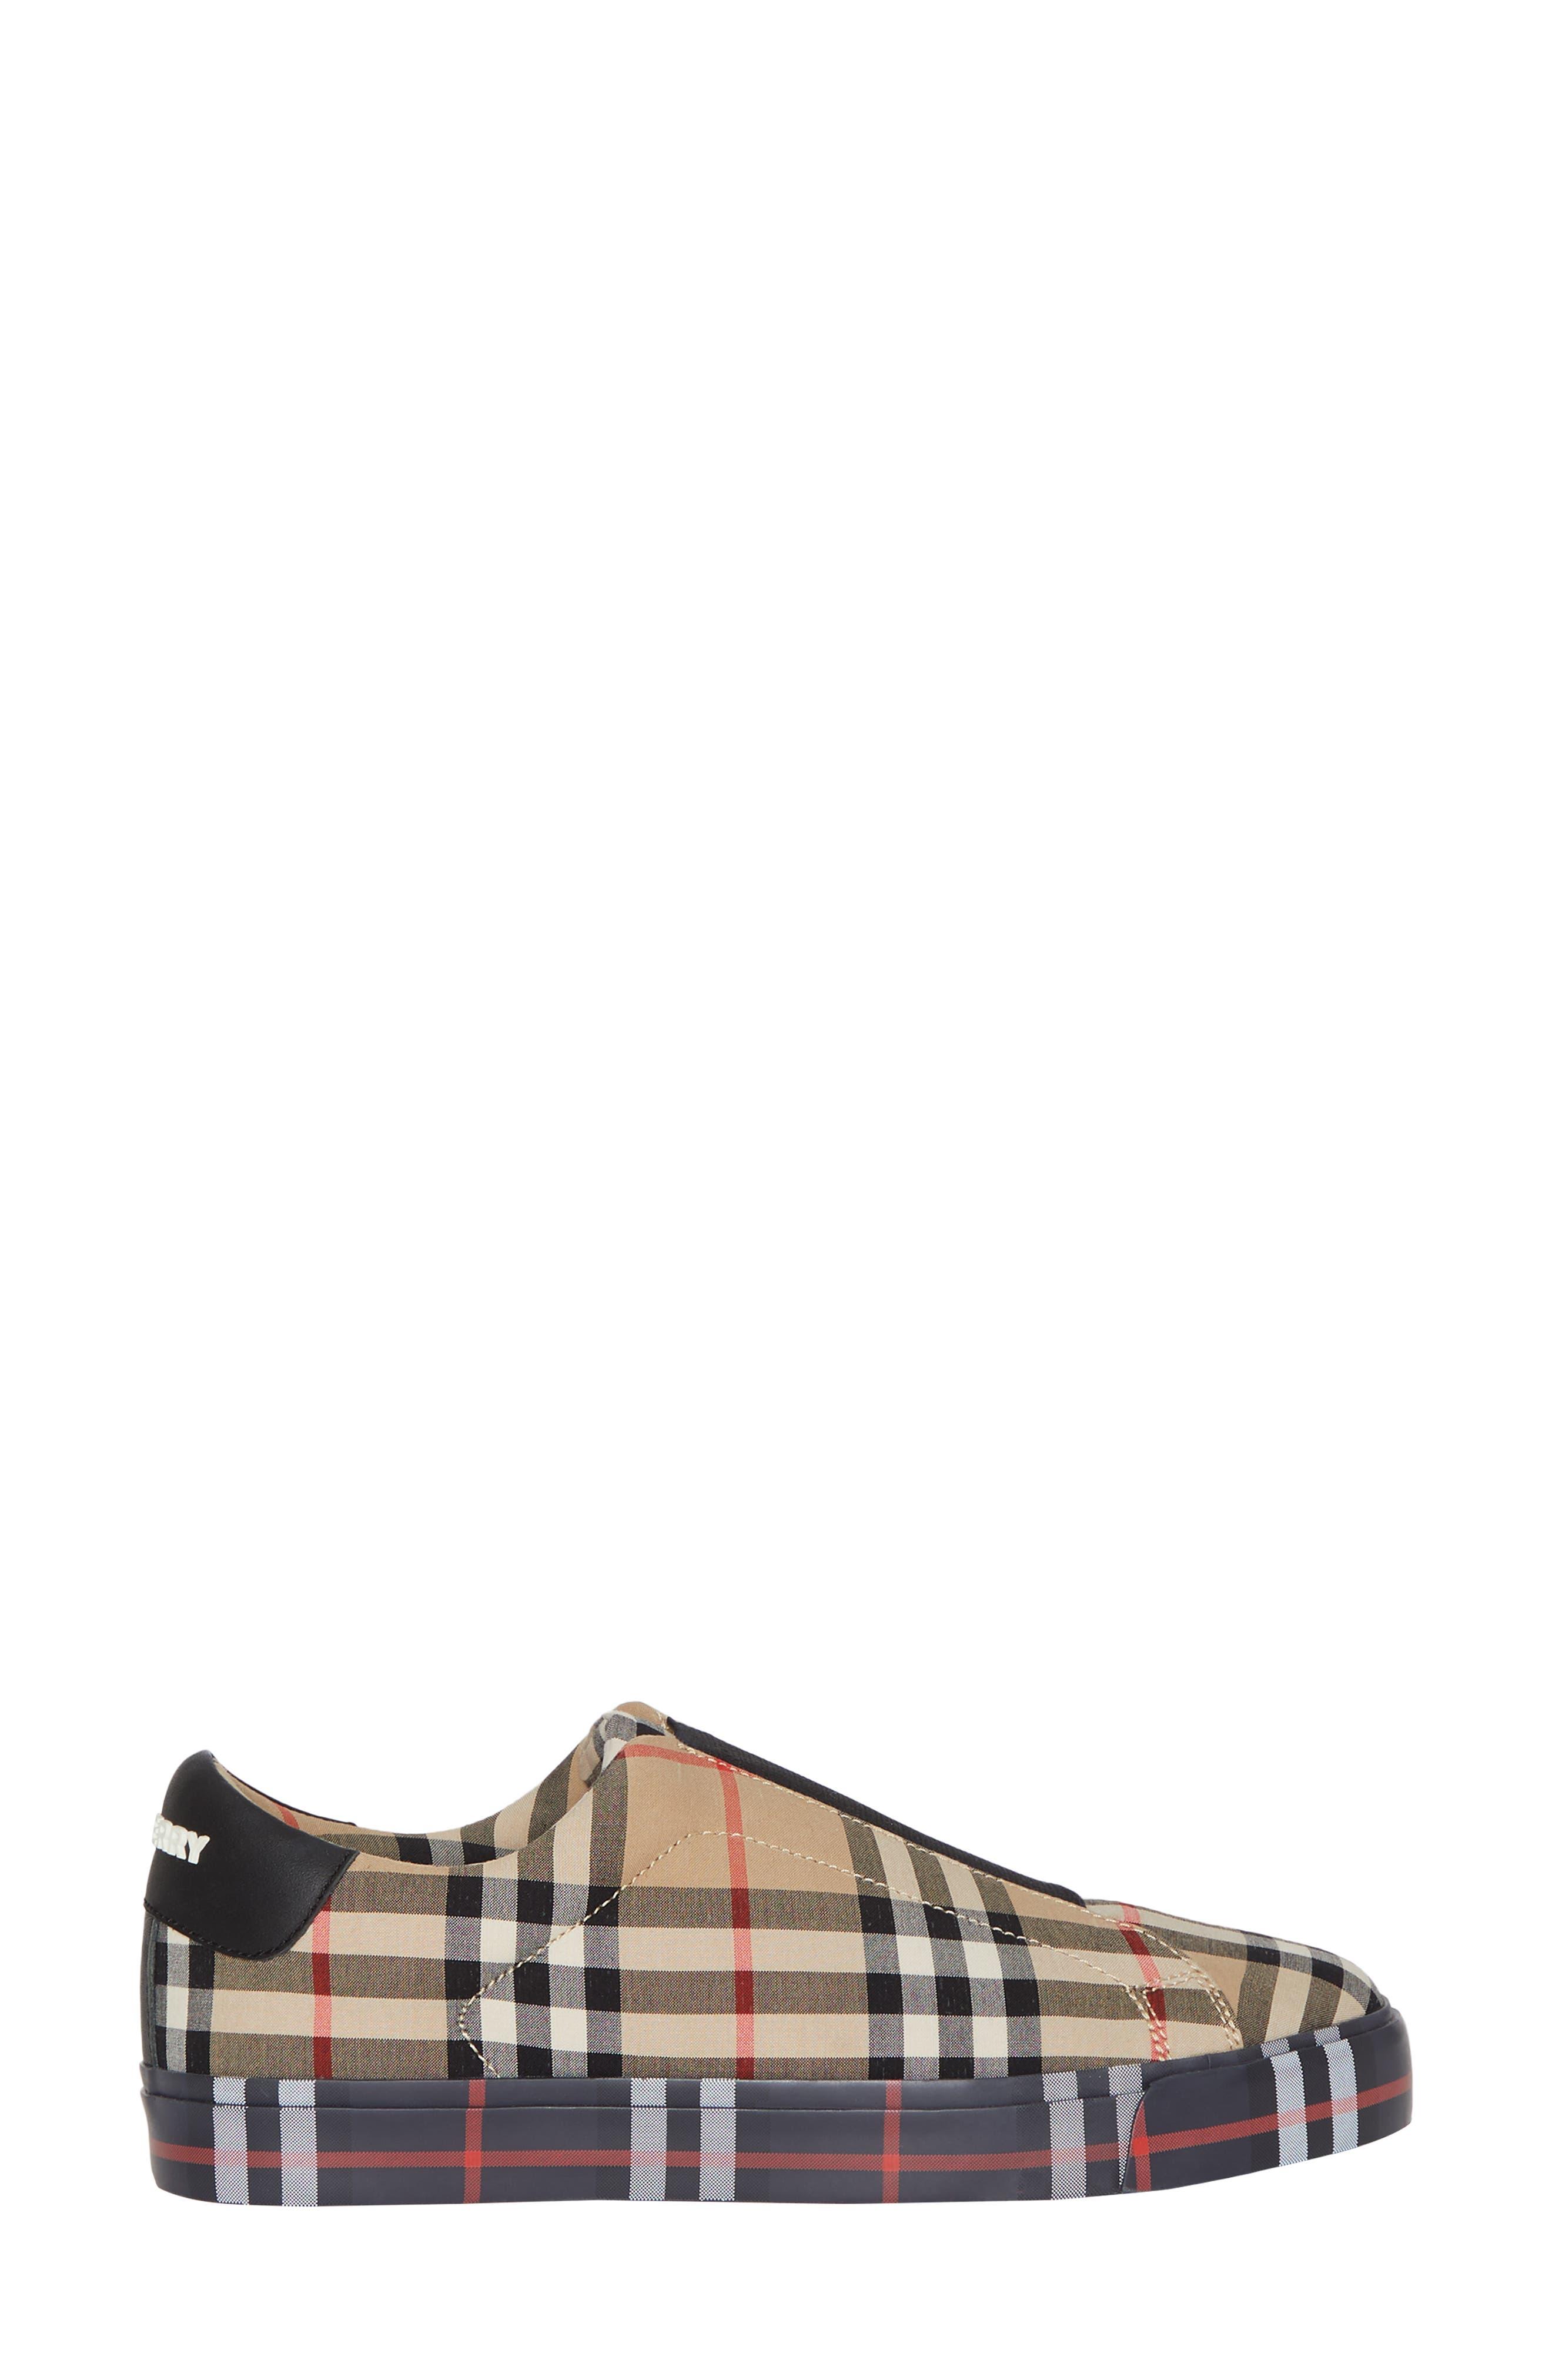 BURBERRY, Markham Vintage Check Slip-On Sneaker, Alternate thumbnail 3, color, BEIGE PLAID